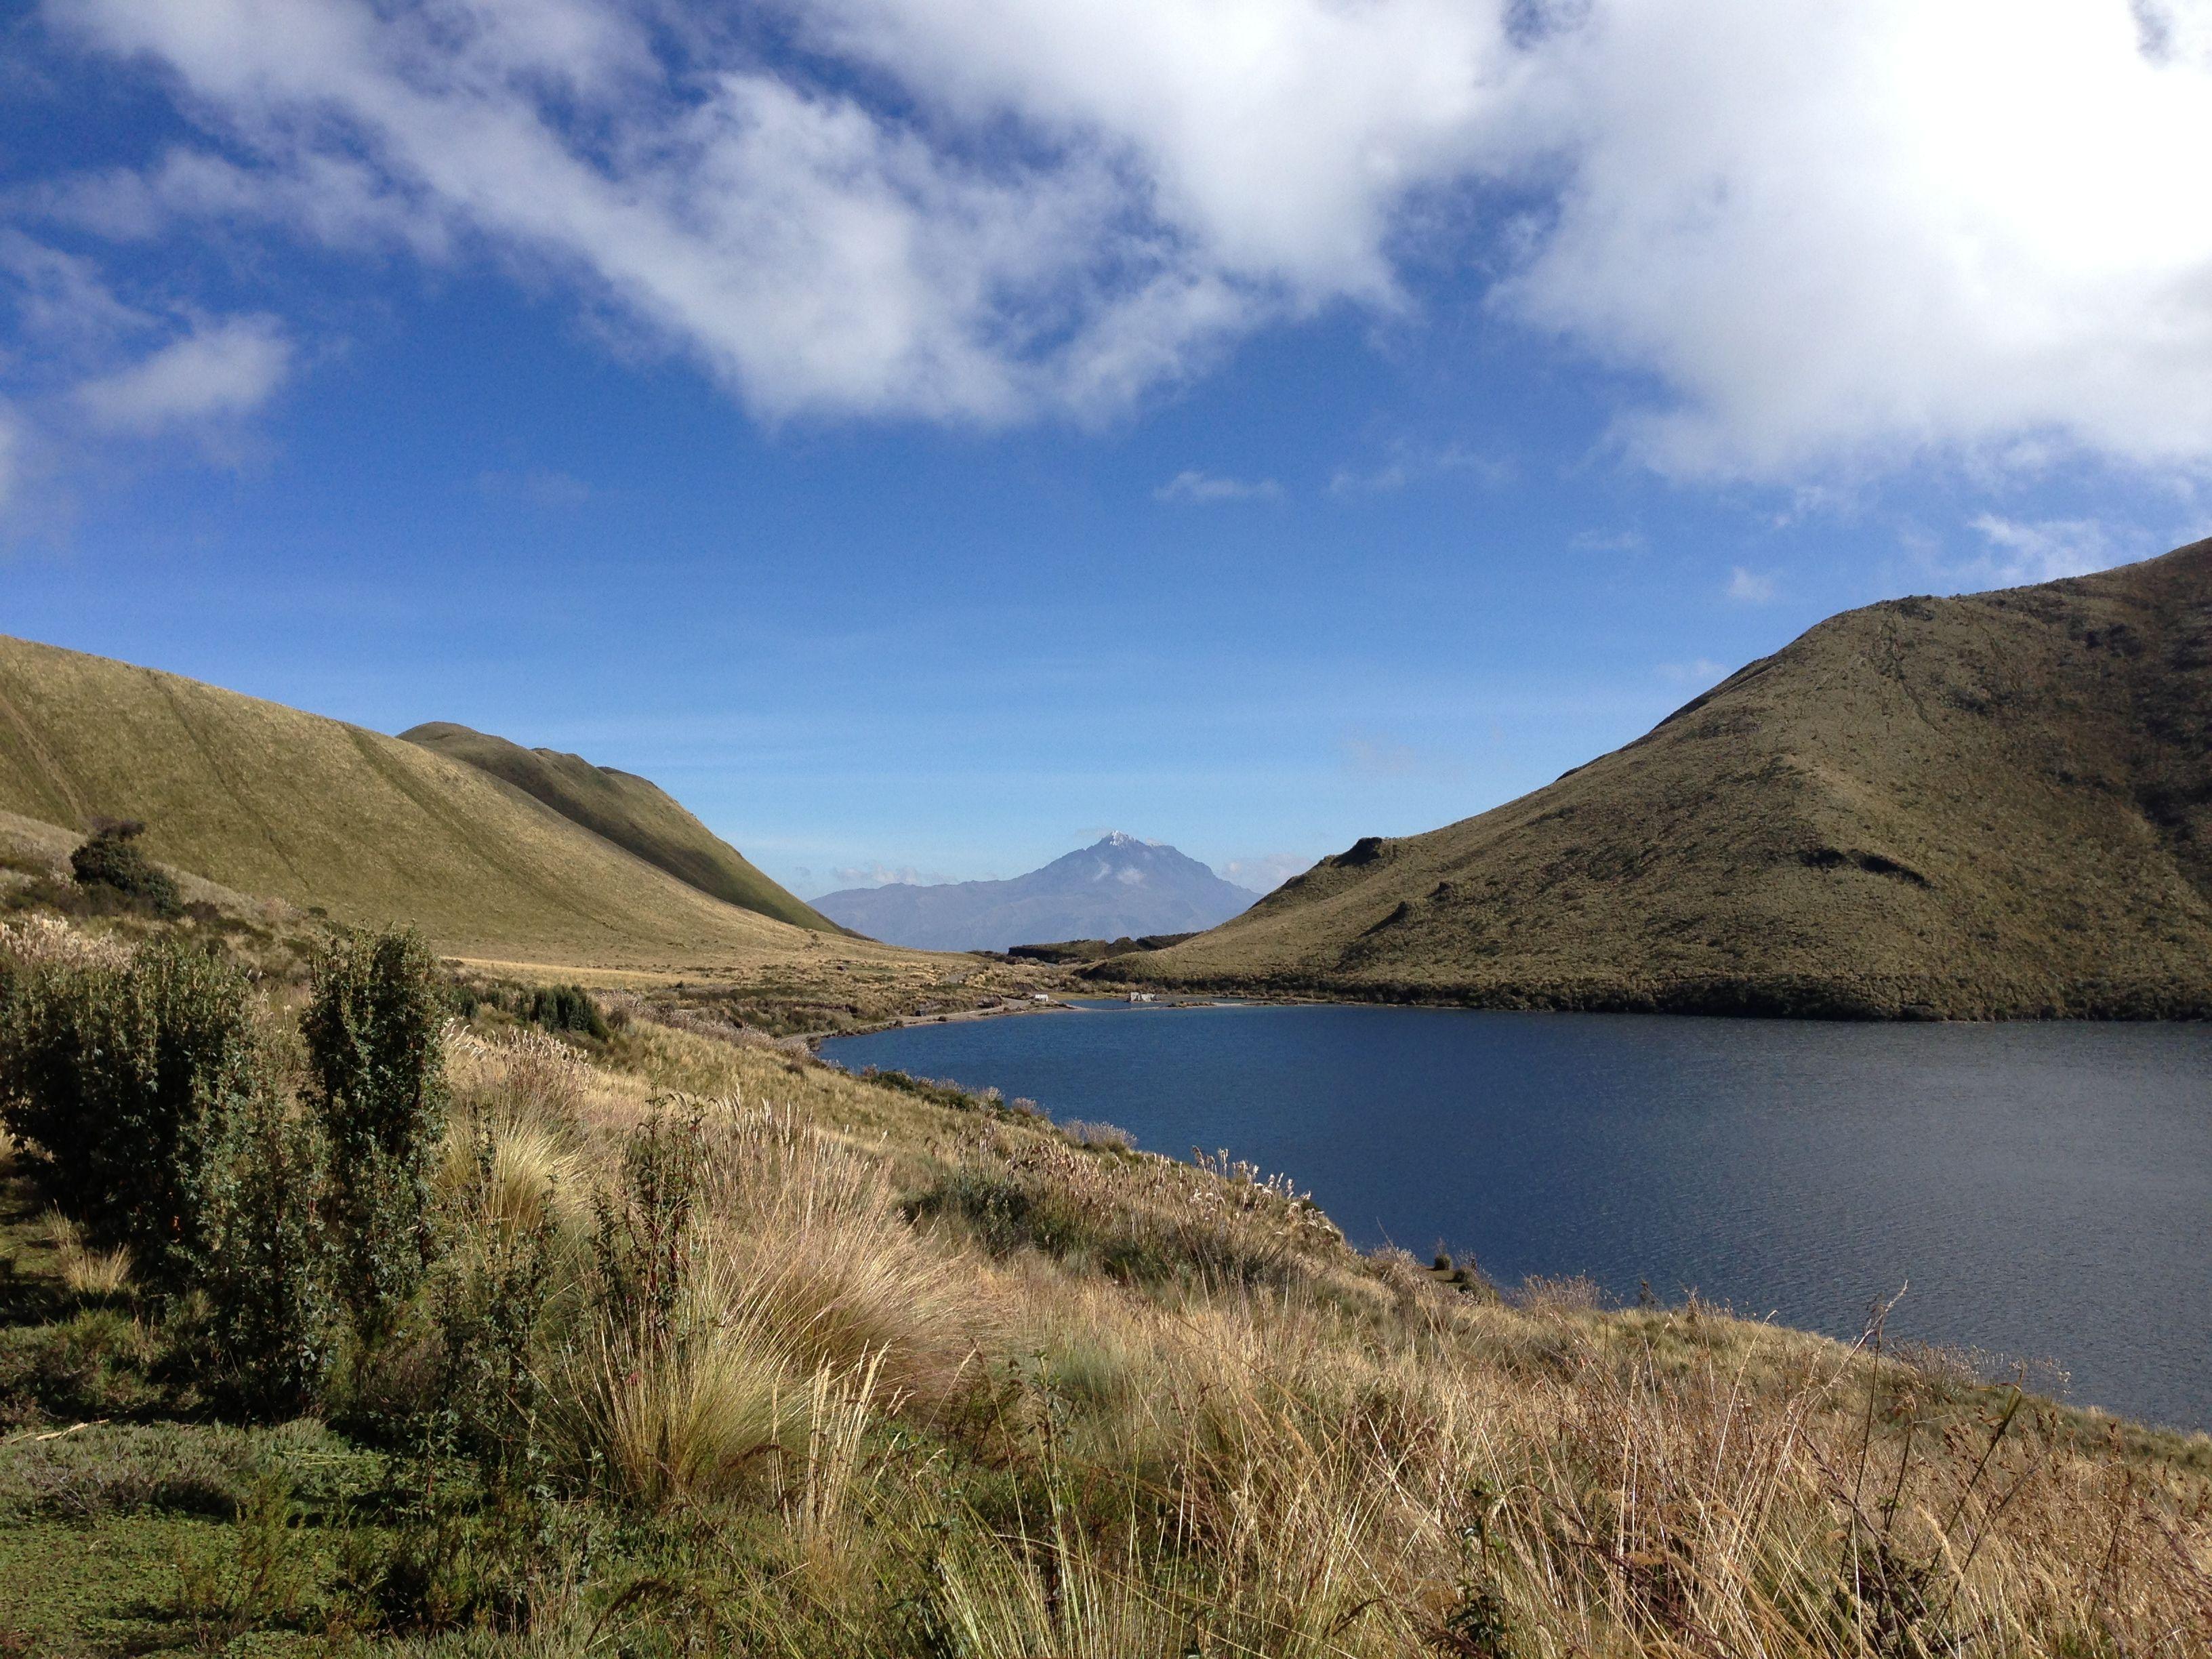 Laguna de Mojanda, Imbabura-Pichincha, Ecuador..!!